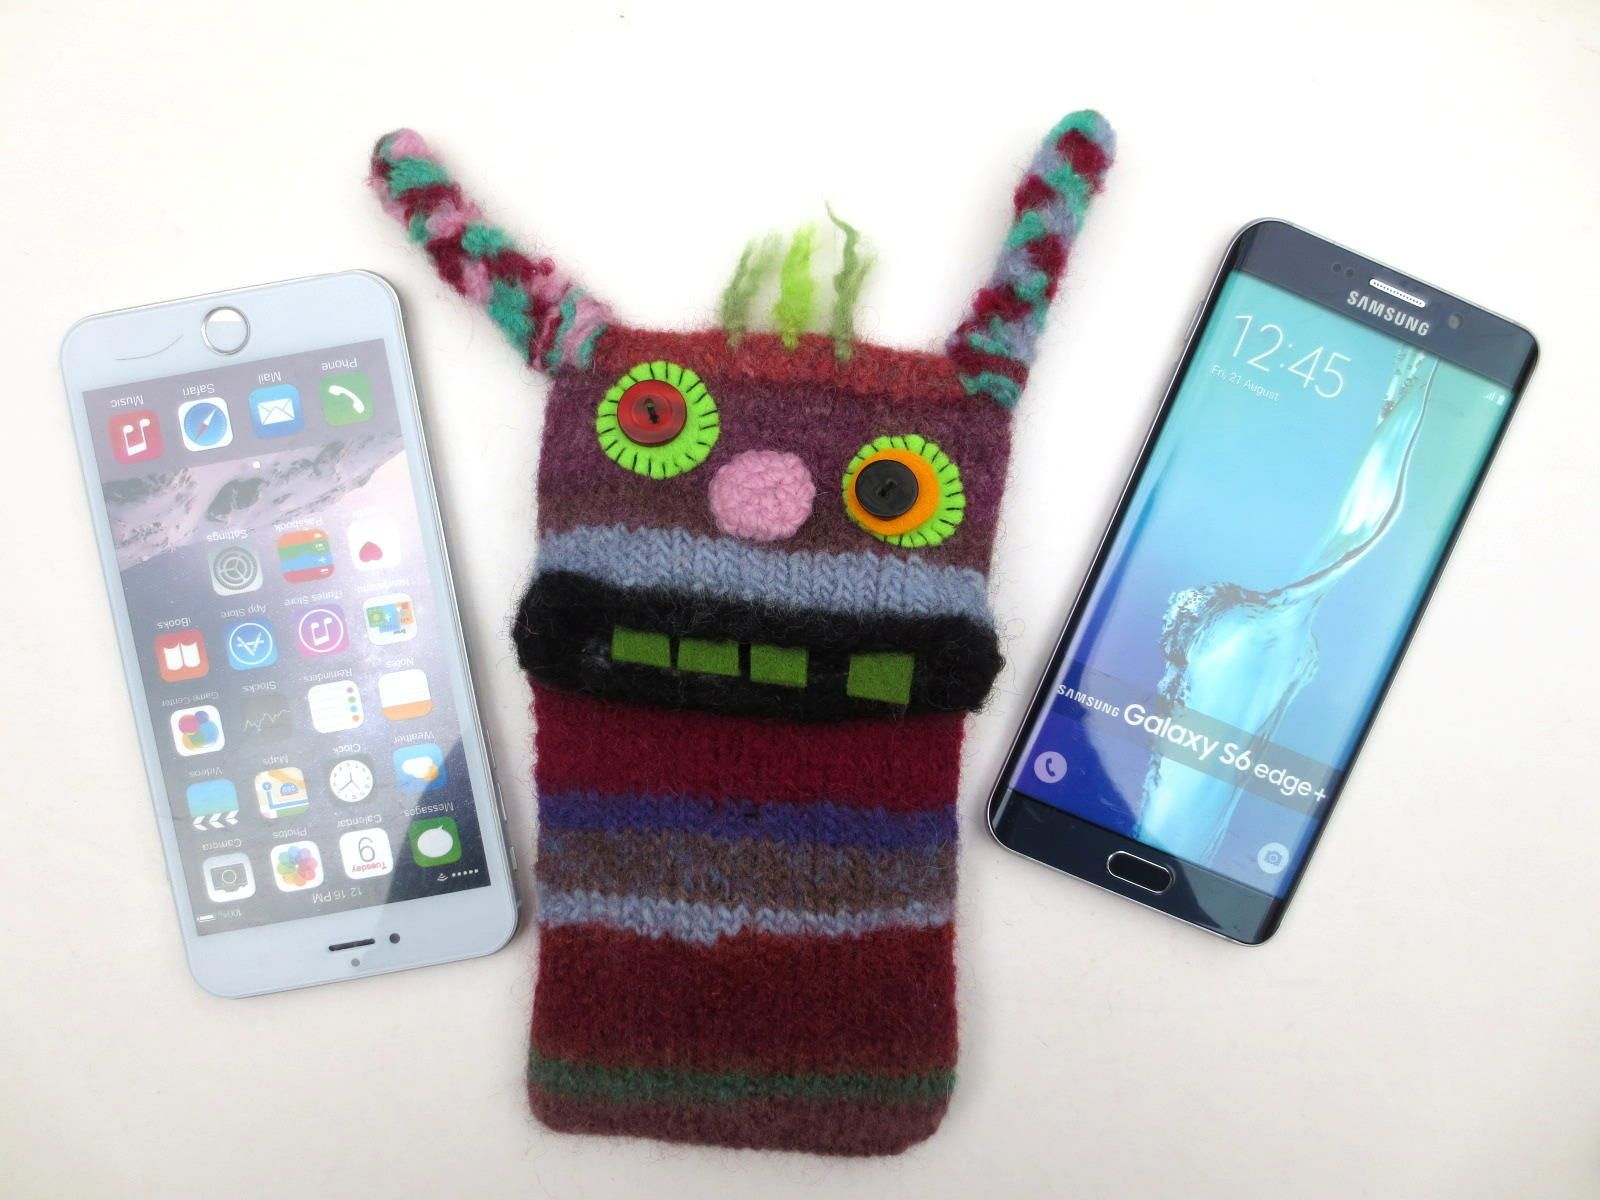 Smartphone Cover Monster Vivien Gefilzt Handy Tasche Hulle S6 Edge Plus Iphone 6 Plus Samsung Galaxy S7 Edge Fi Smartphone Hulle Iphone 6 Smartphone